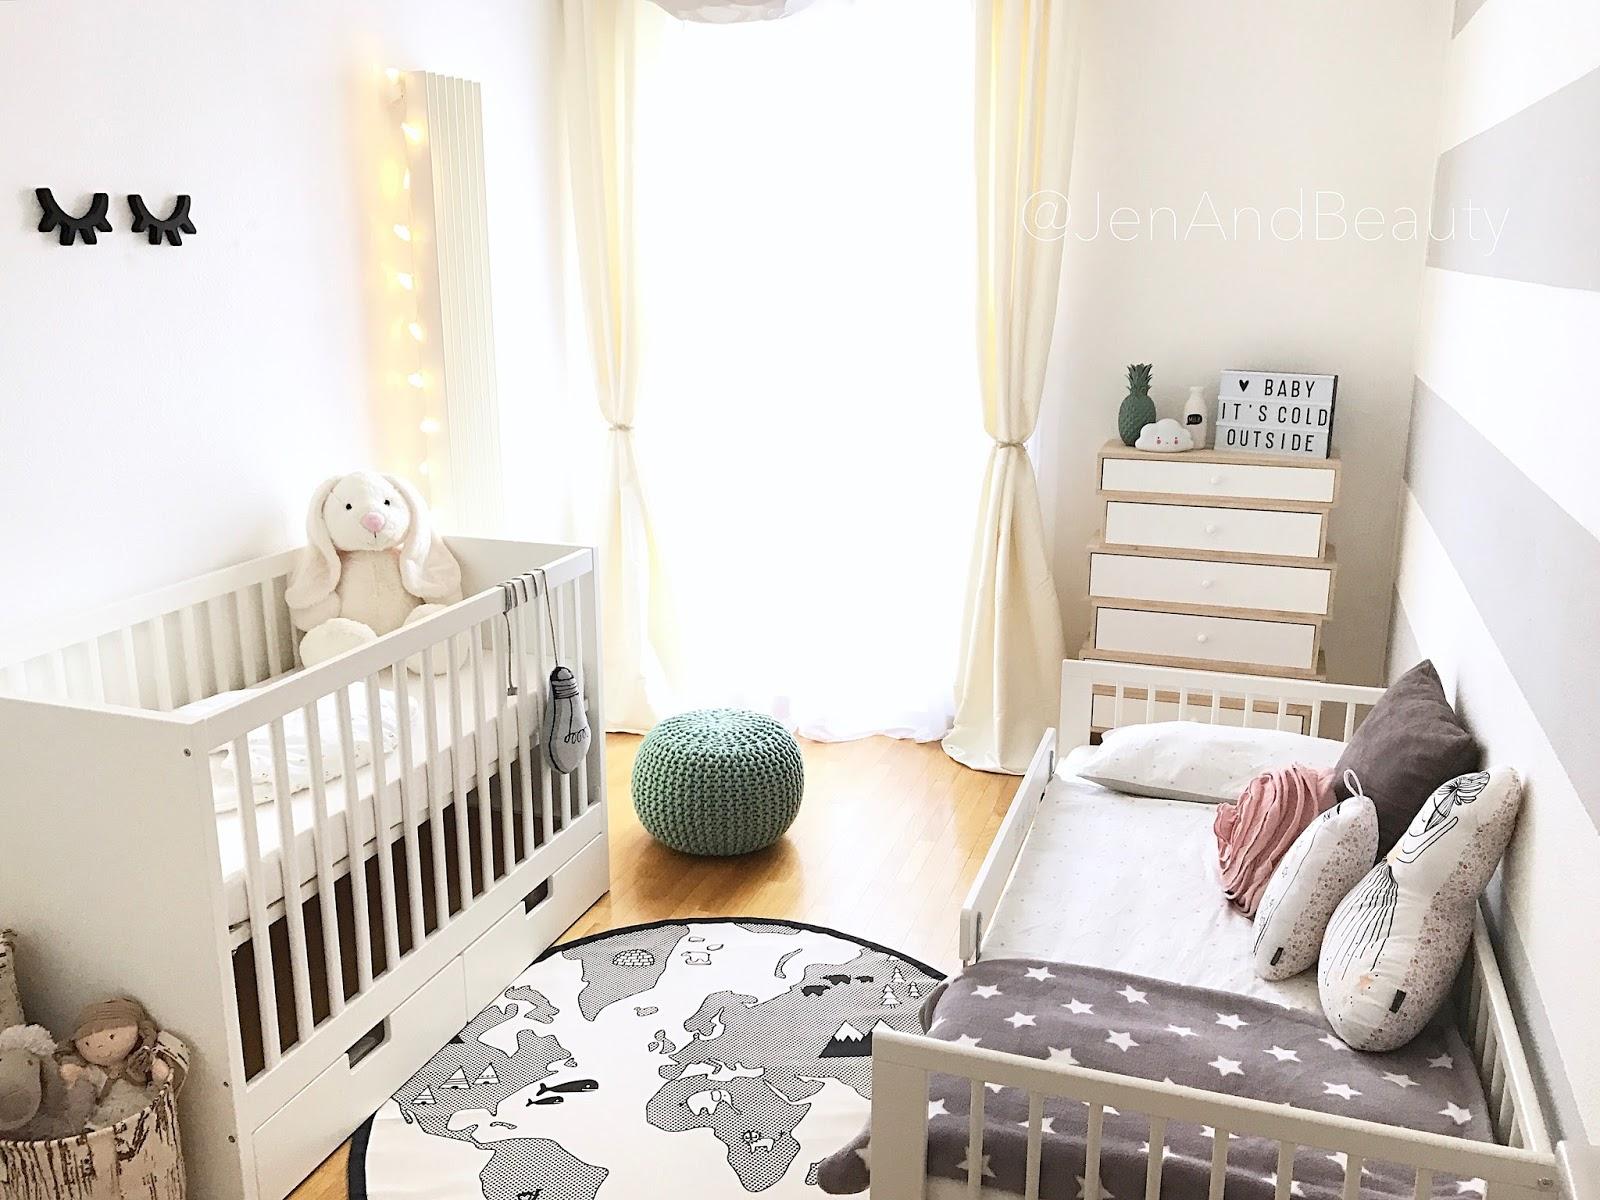 jen and beauty la chambre d 39 enfant de ma et du futur b b. Black Bedroom Furniture Sets. Home Design Ideas